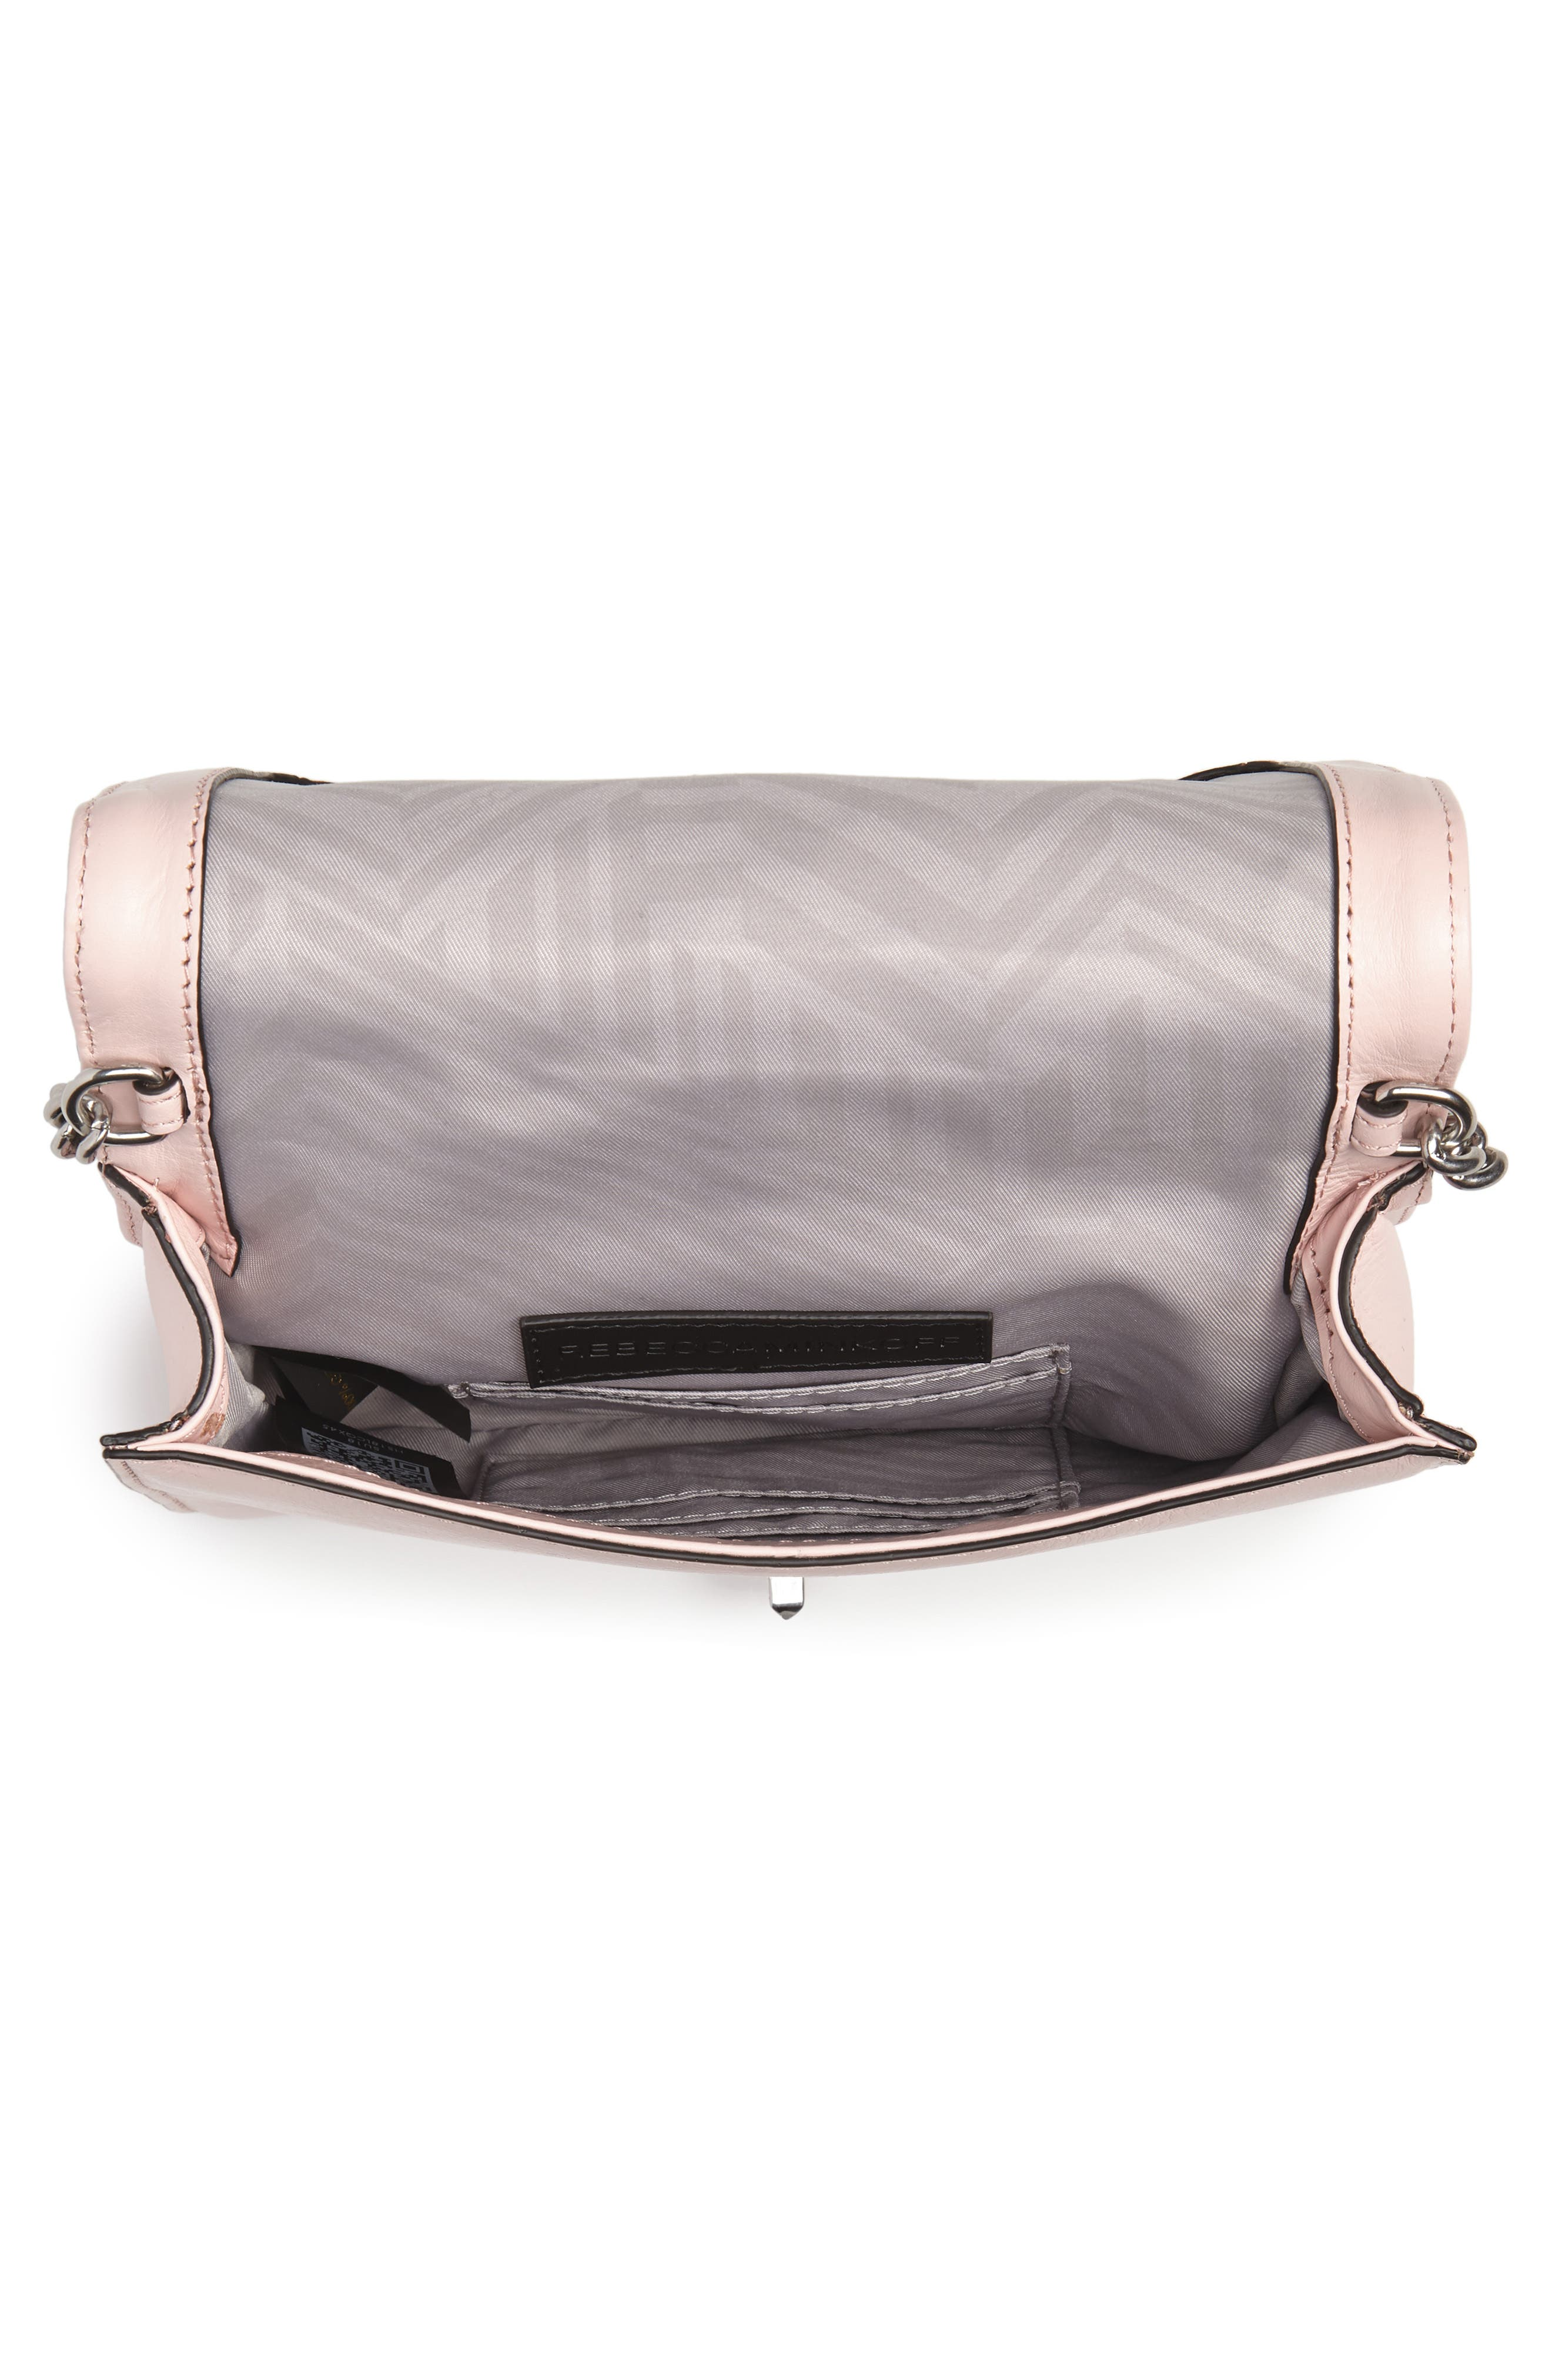 Small Love Leather Crossbody Bag,                             Alternate thumbnail 4, color,                             PEONY